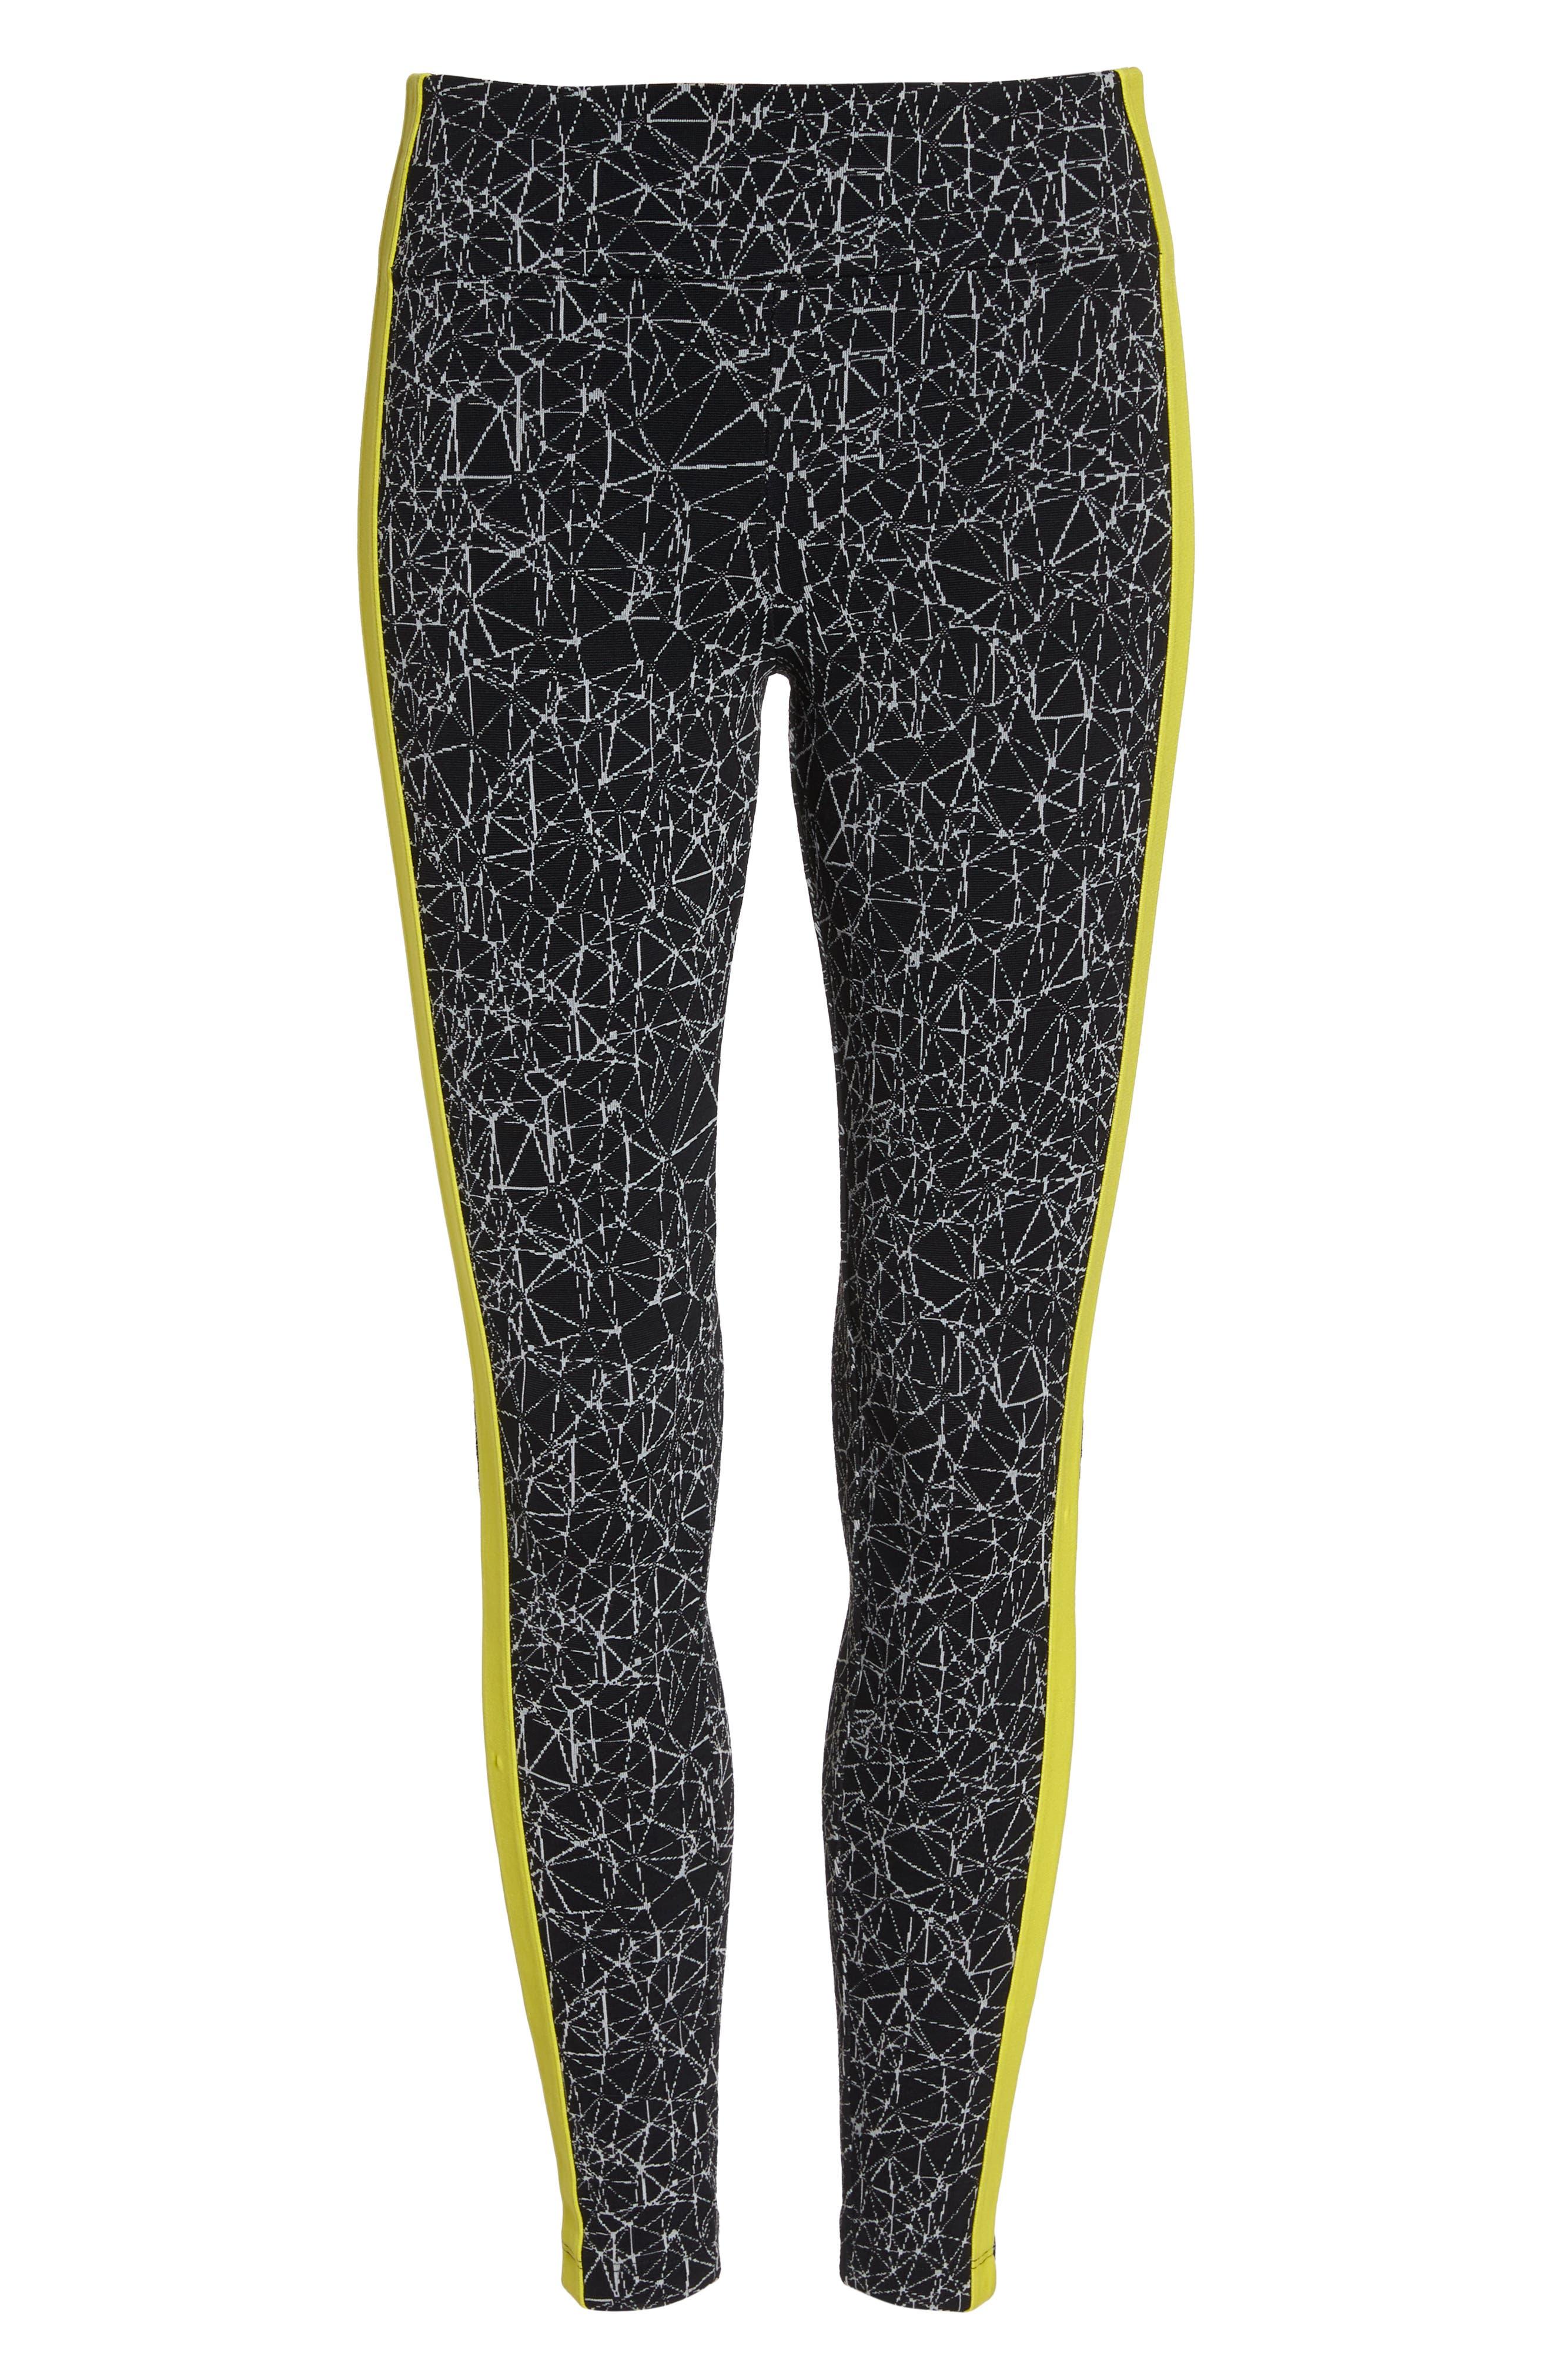 Molecular Wren High Waist Leggings,                             Alternate thumbnail 7, color,                             Molecular Black